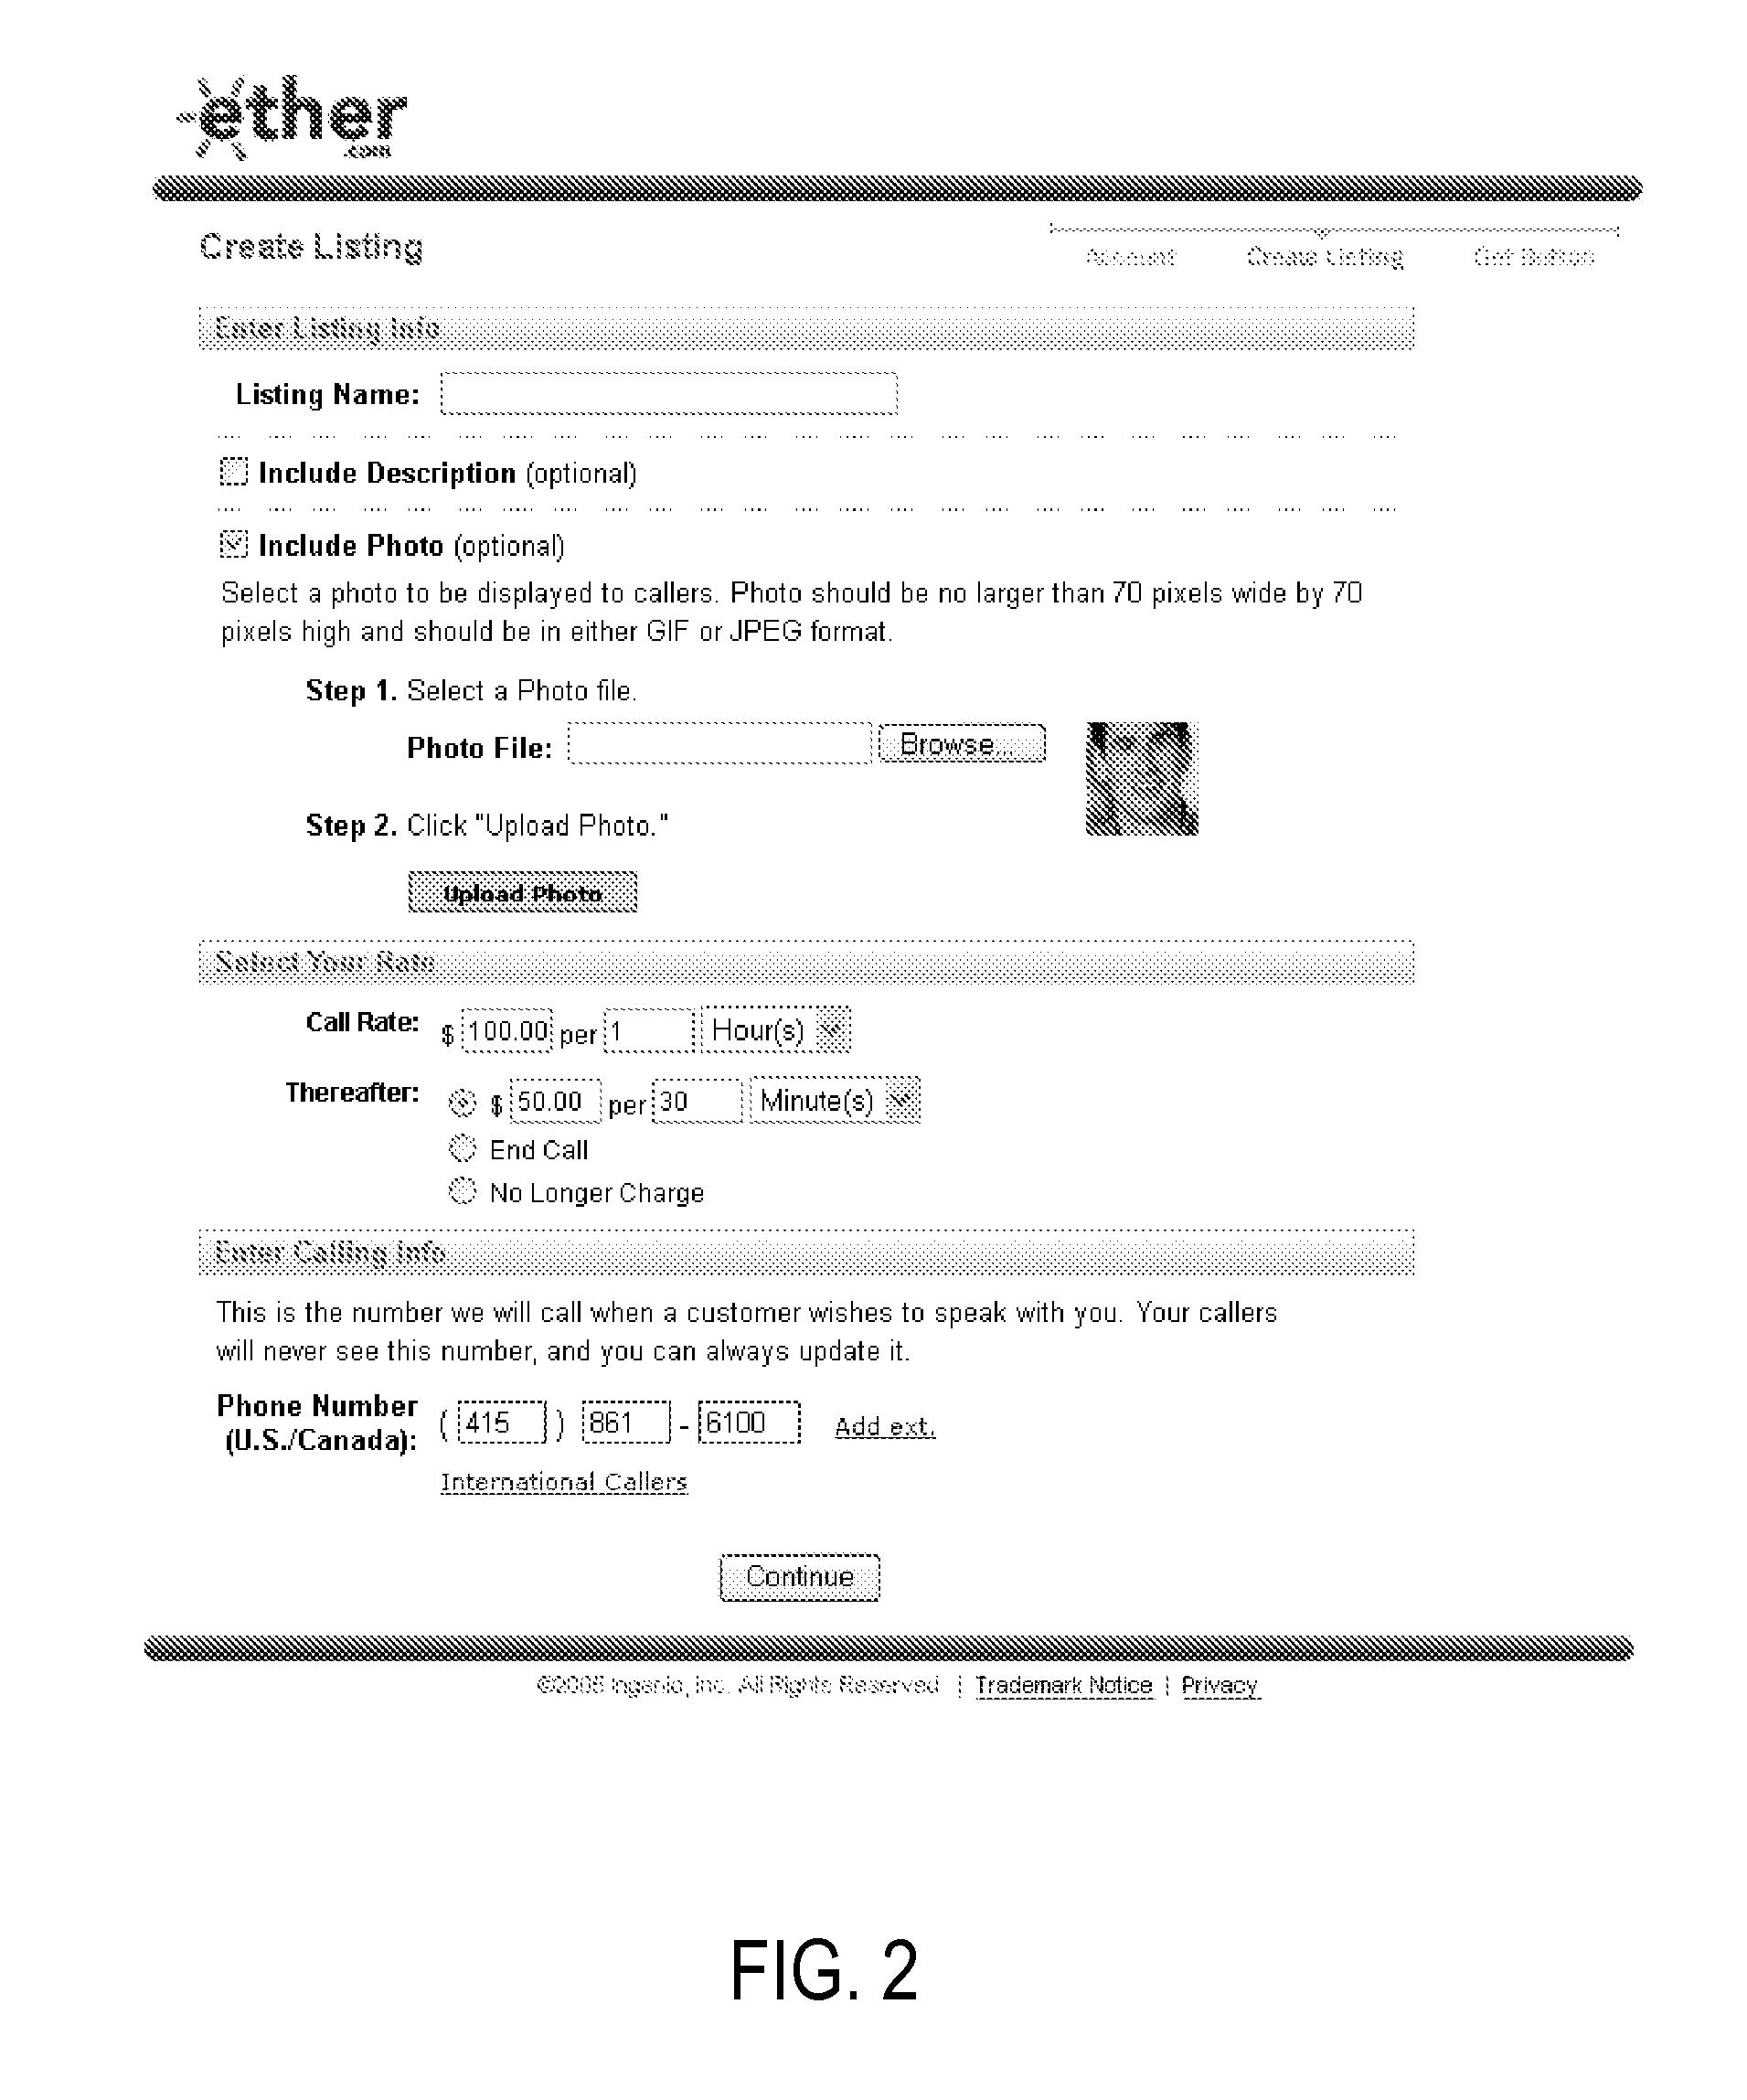 Patent US 9,197,479 B2